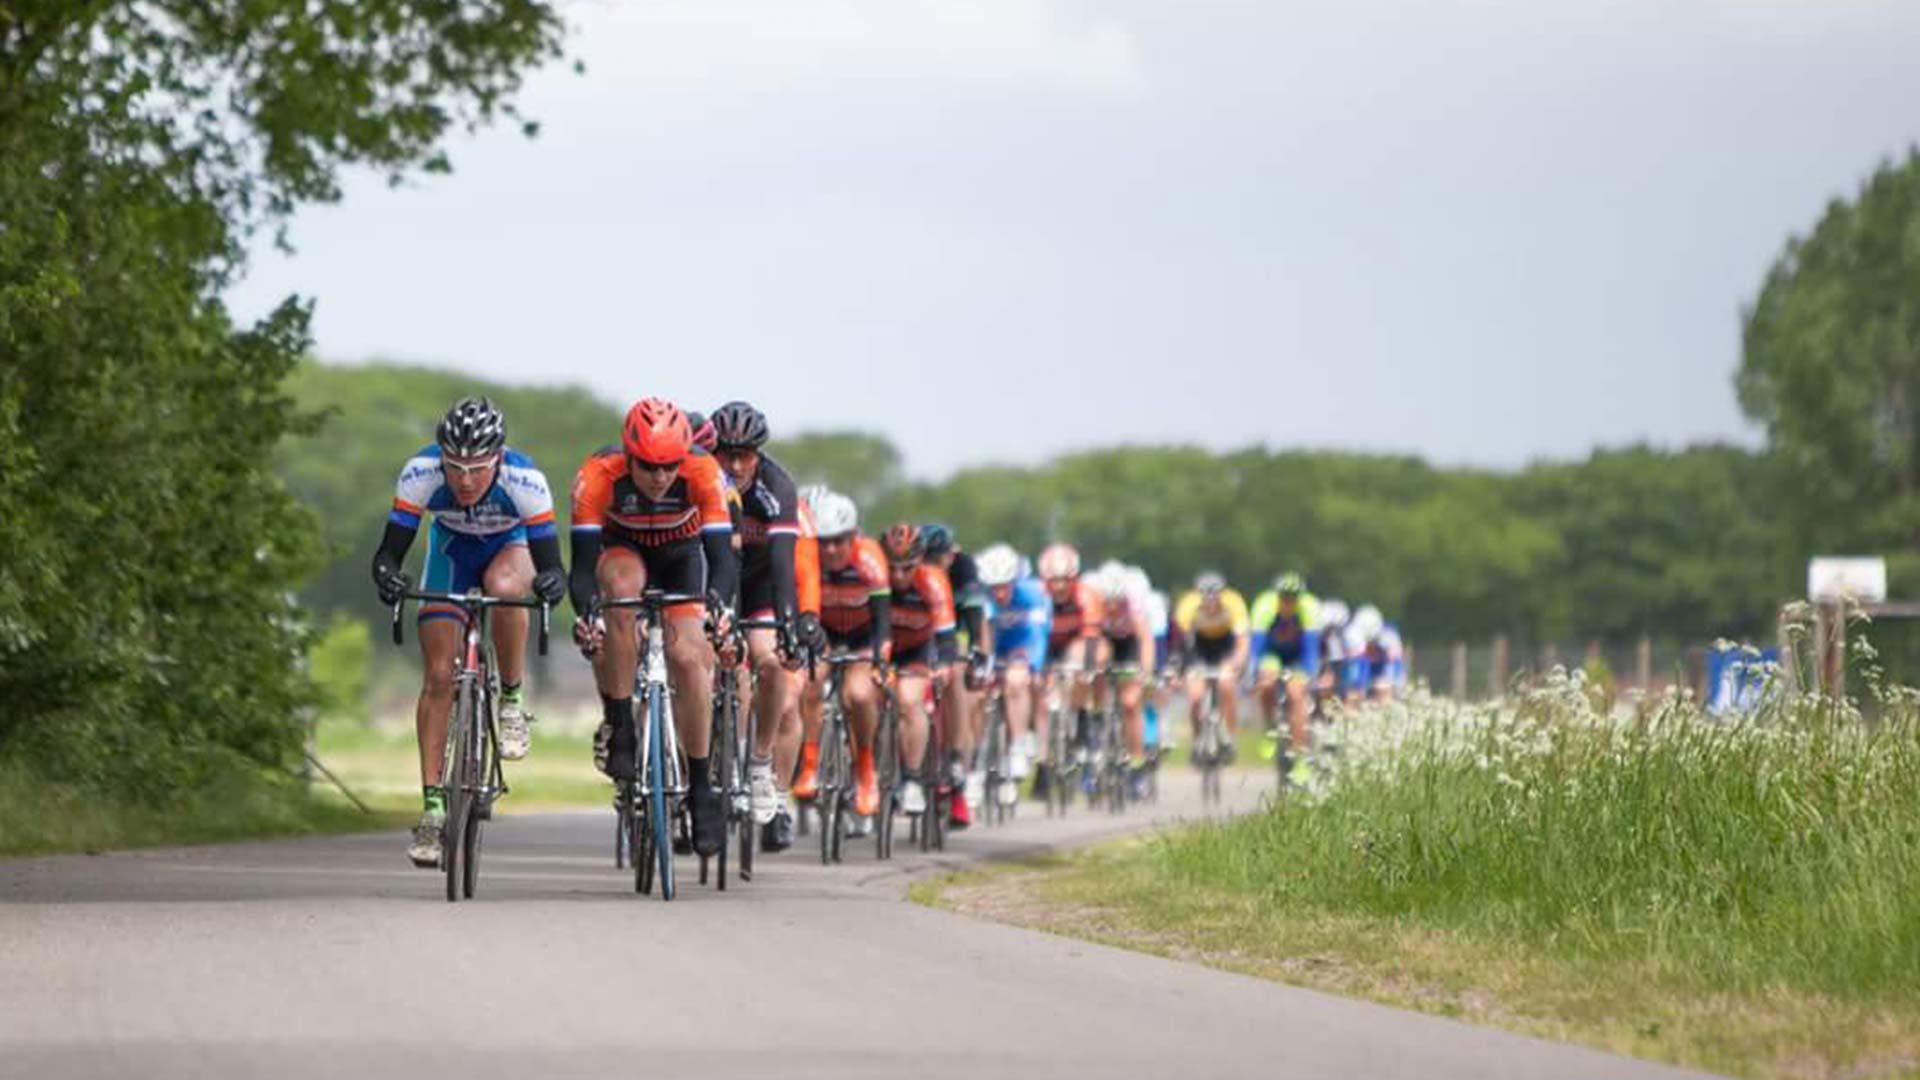 Vijf type fietsers die je in elke fietsgroep tegenkomt